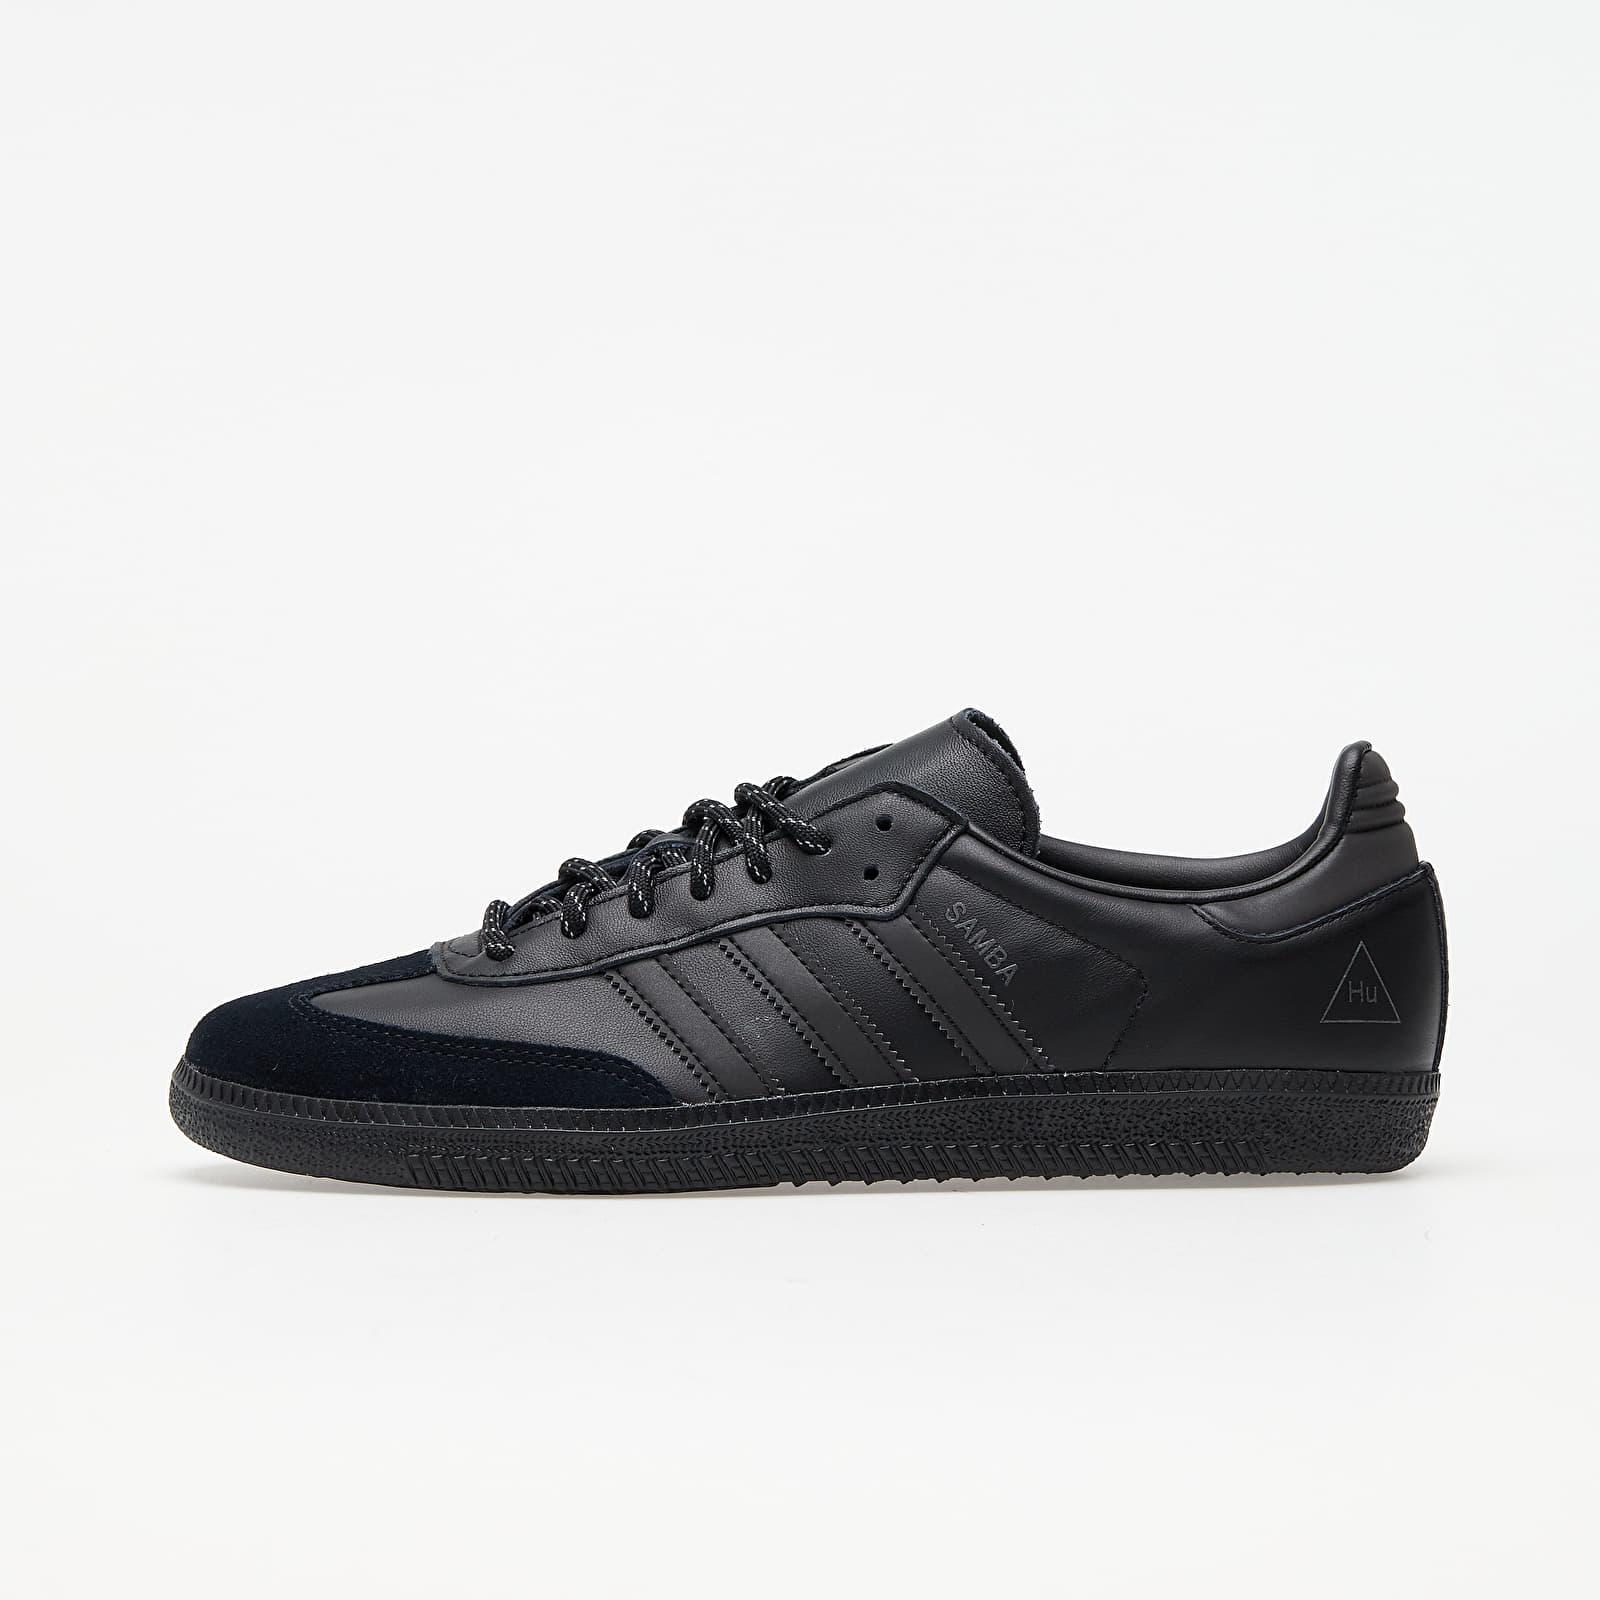 adidas x Pharrell Williams Samba Core Black/ Core Black/ Core Black EUR 36 2/3